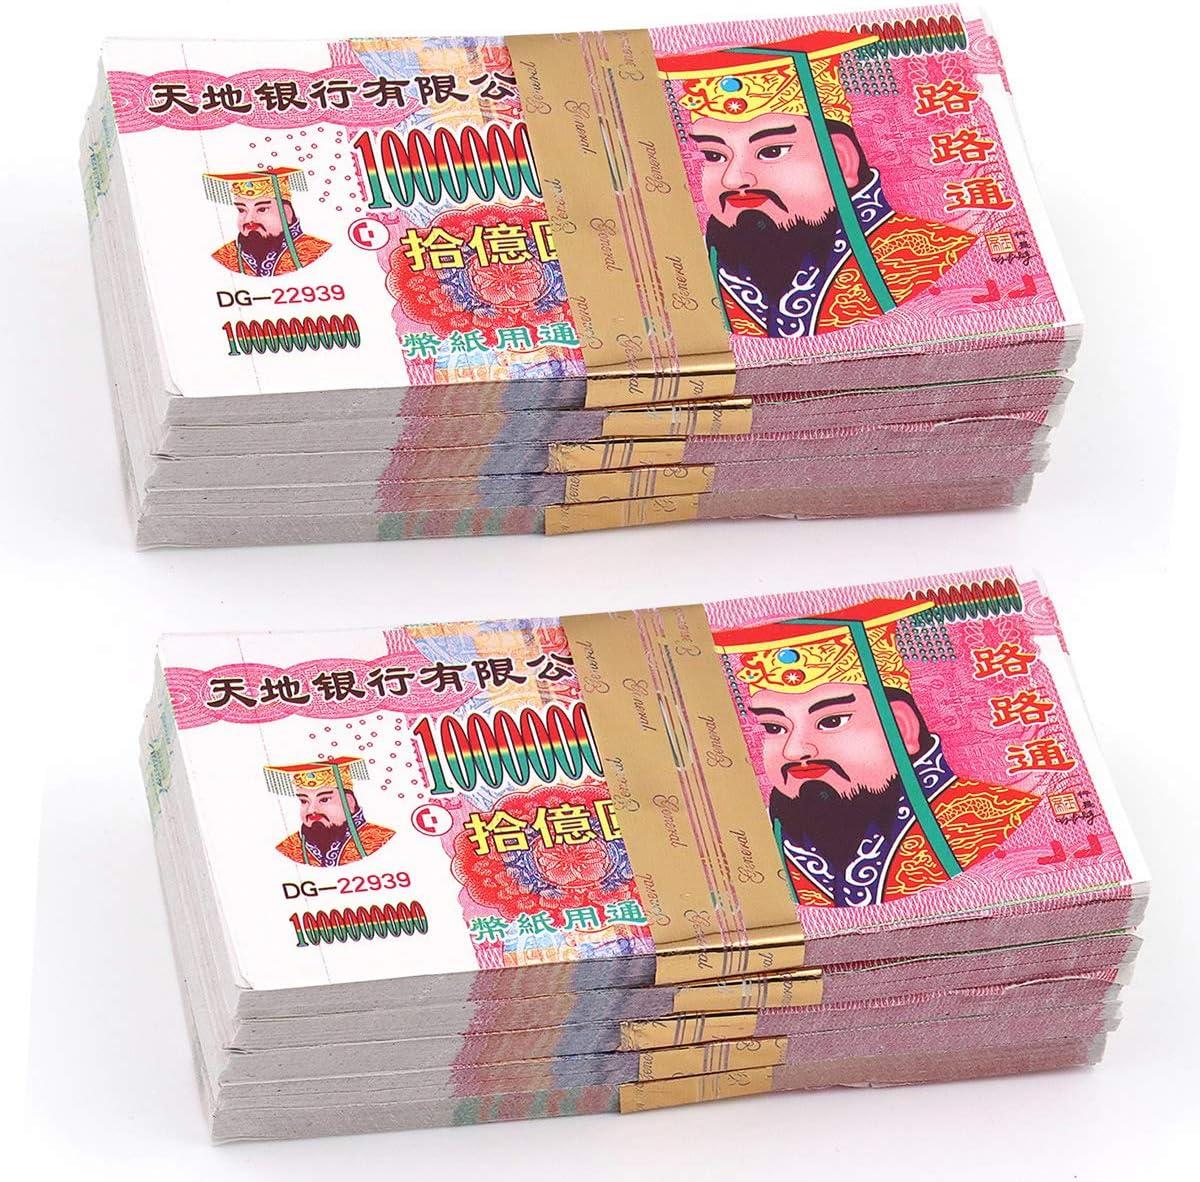 Ancestbless Ancestor Money 2021 spring and summer new Selling Joss Paper to Burn Pcs Emper 500 Jade